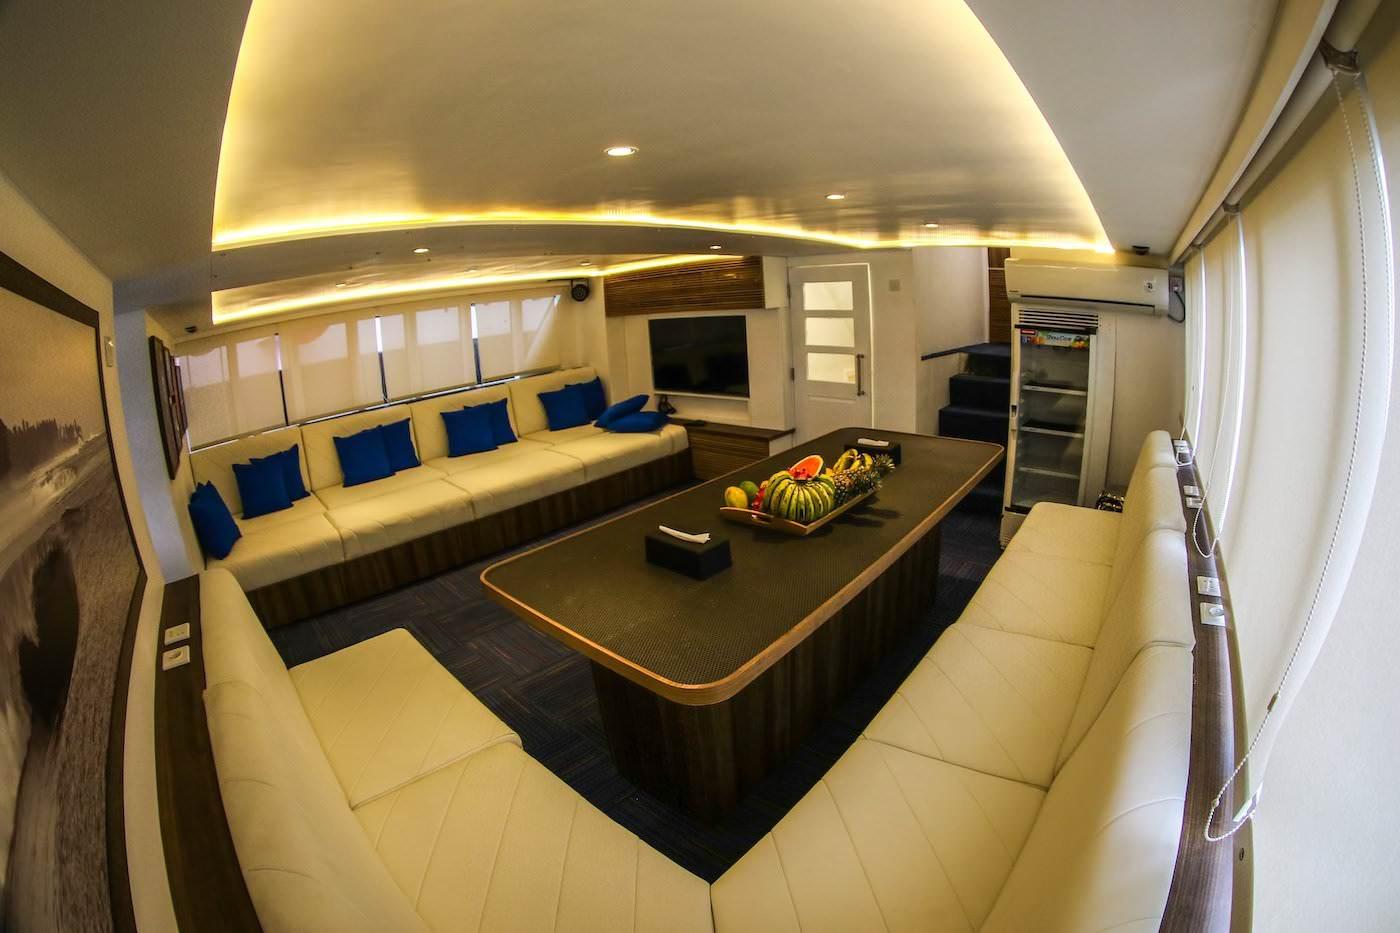 Star Koat 2 Surf Charter Mentawai Banyaks Hinako Islands Trip Lounge